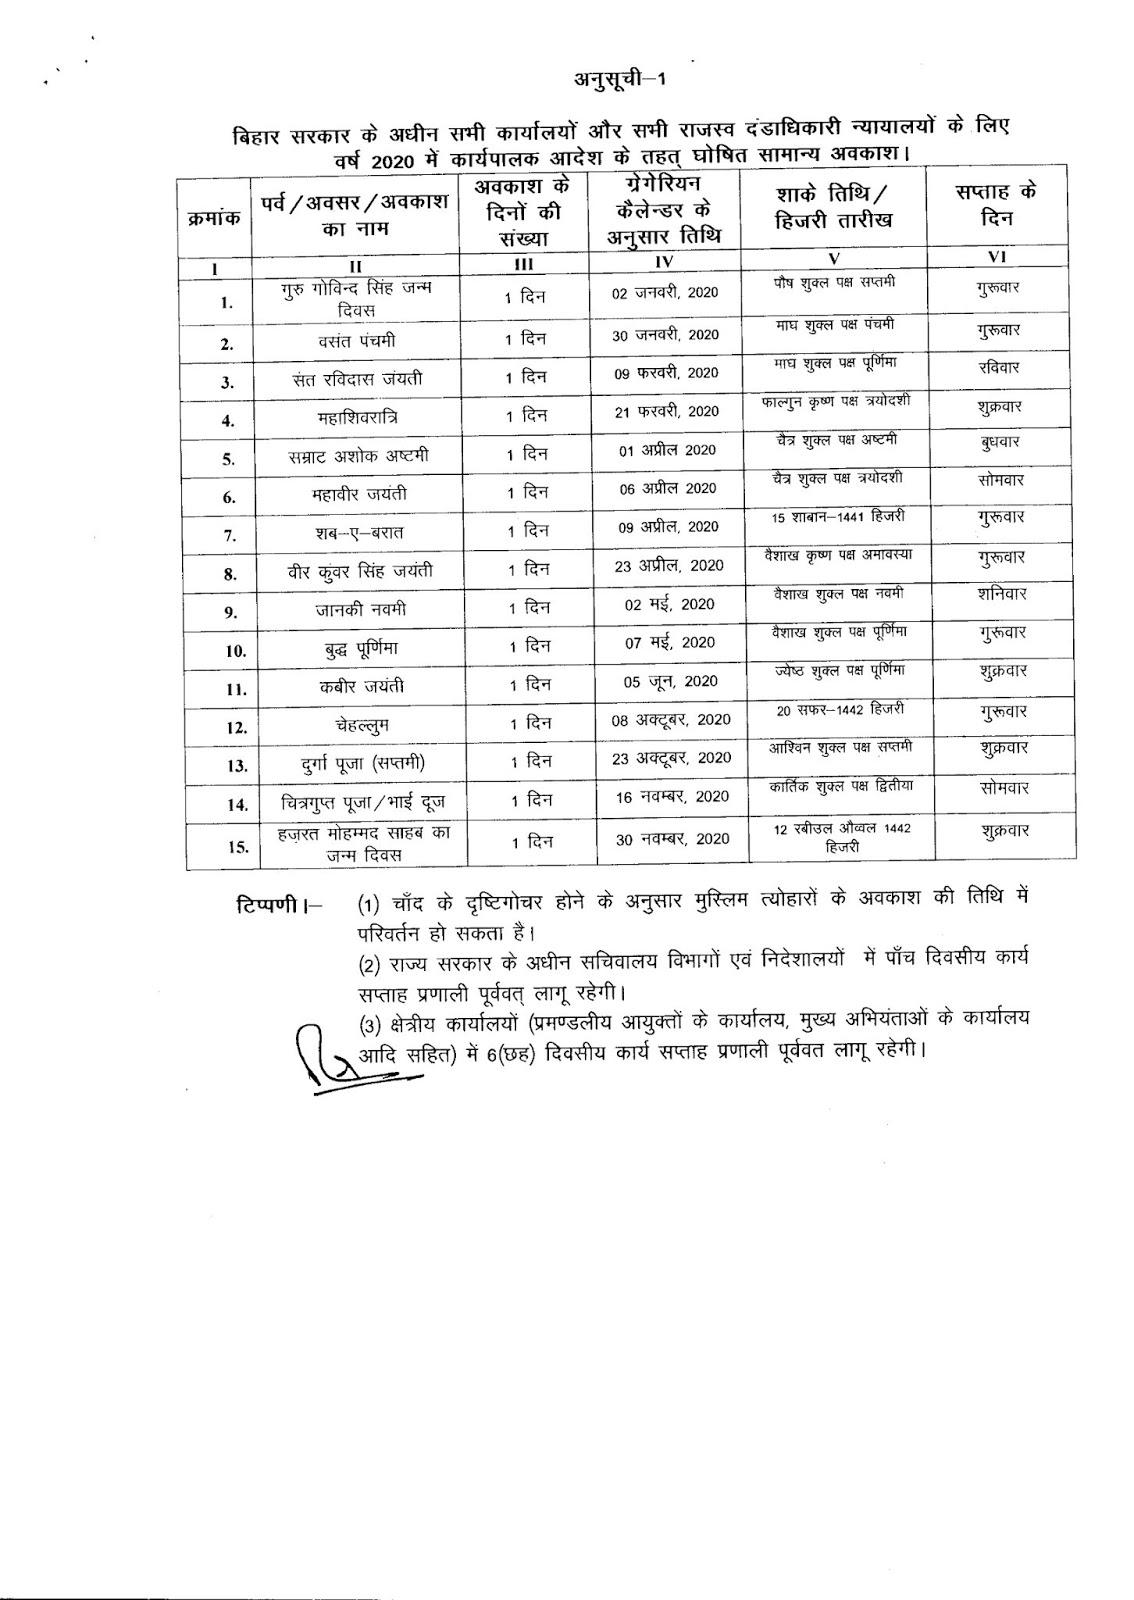 Bihar Government Calendar 2020 #educratsweb with Bihar Sarkar Calender 2020